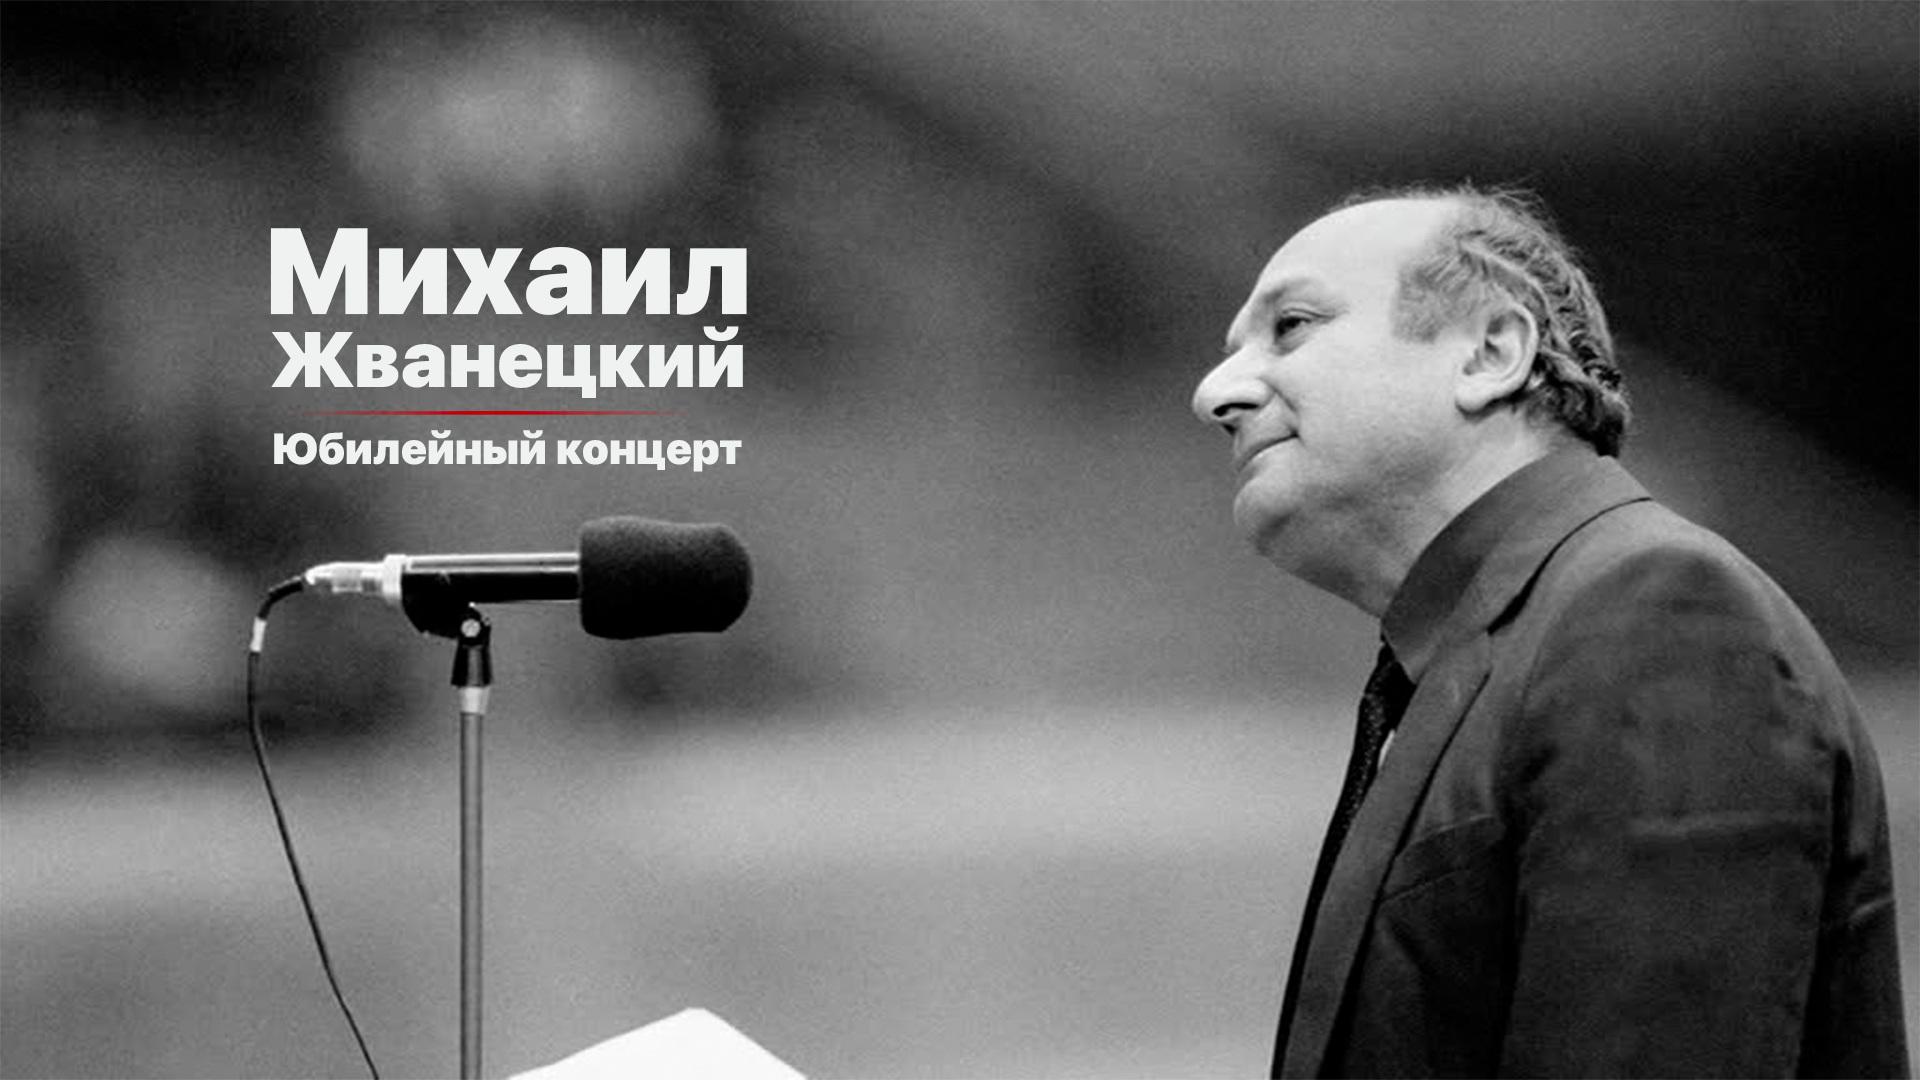 Михаил Жванецкий. Юбилейный концерт